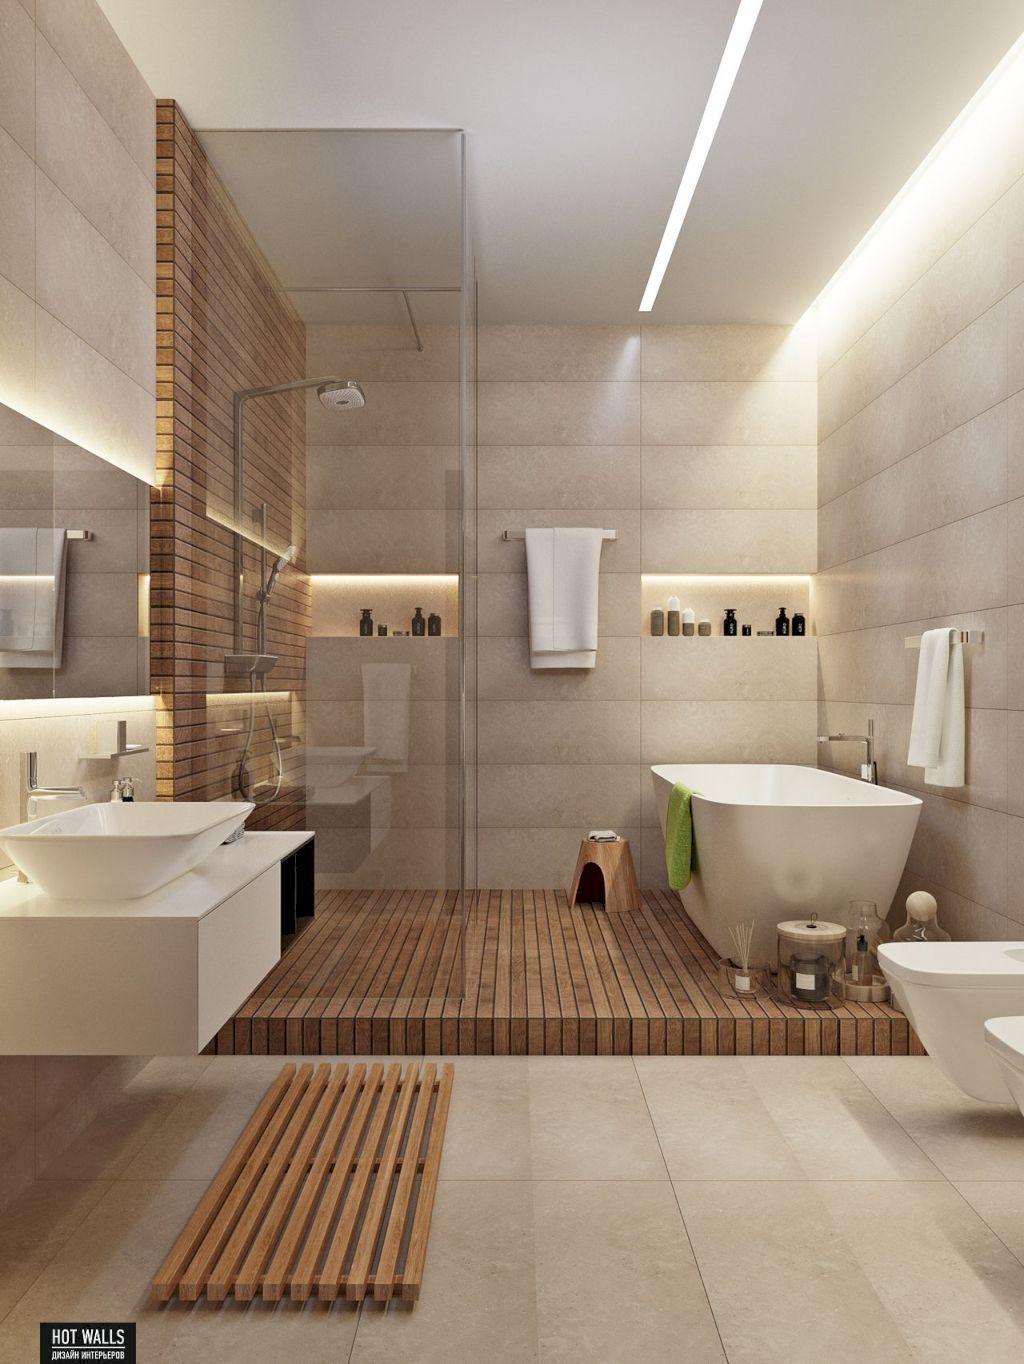 100 Storage Scandinavian Design Furniture For Cozy Environment Https Carrebianhome Com 100 Storag Badezimmer Design Bad Inspiration Kleine Badezimmer Design